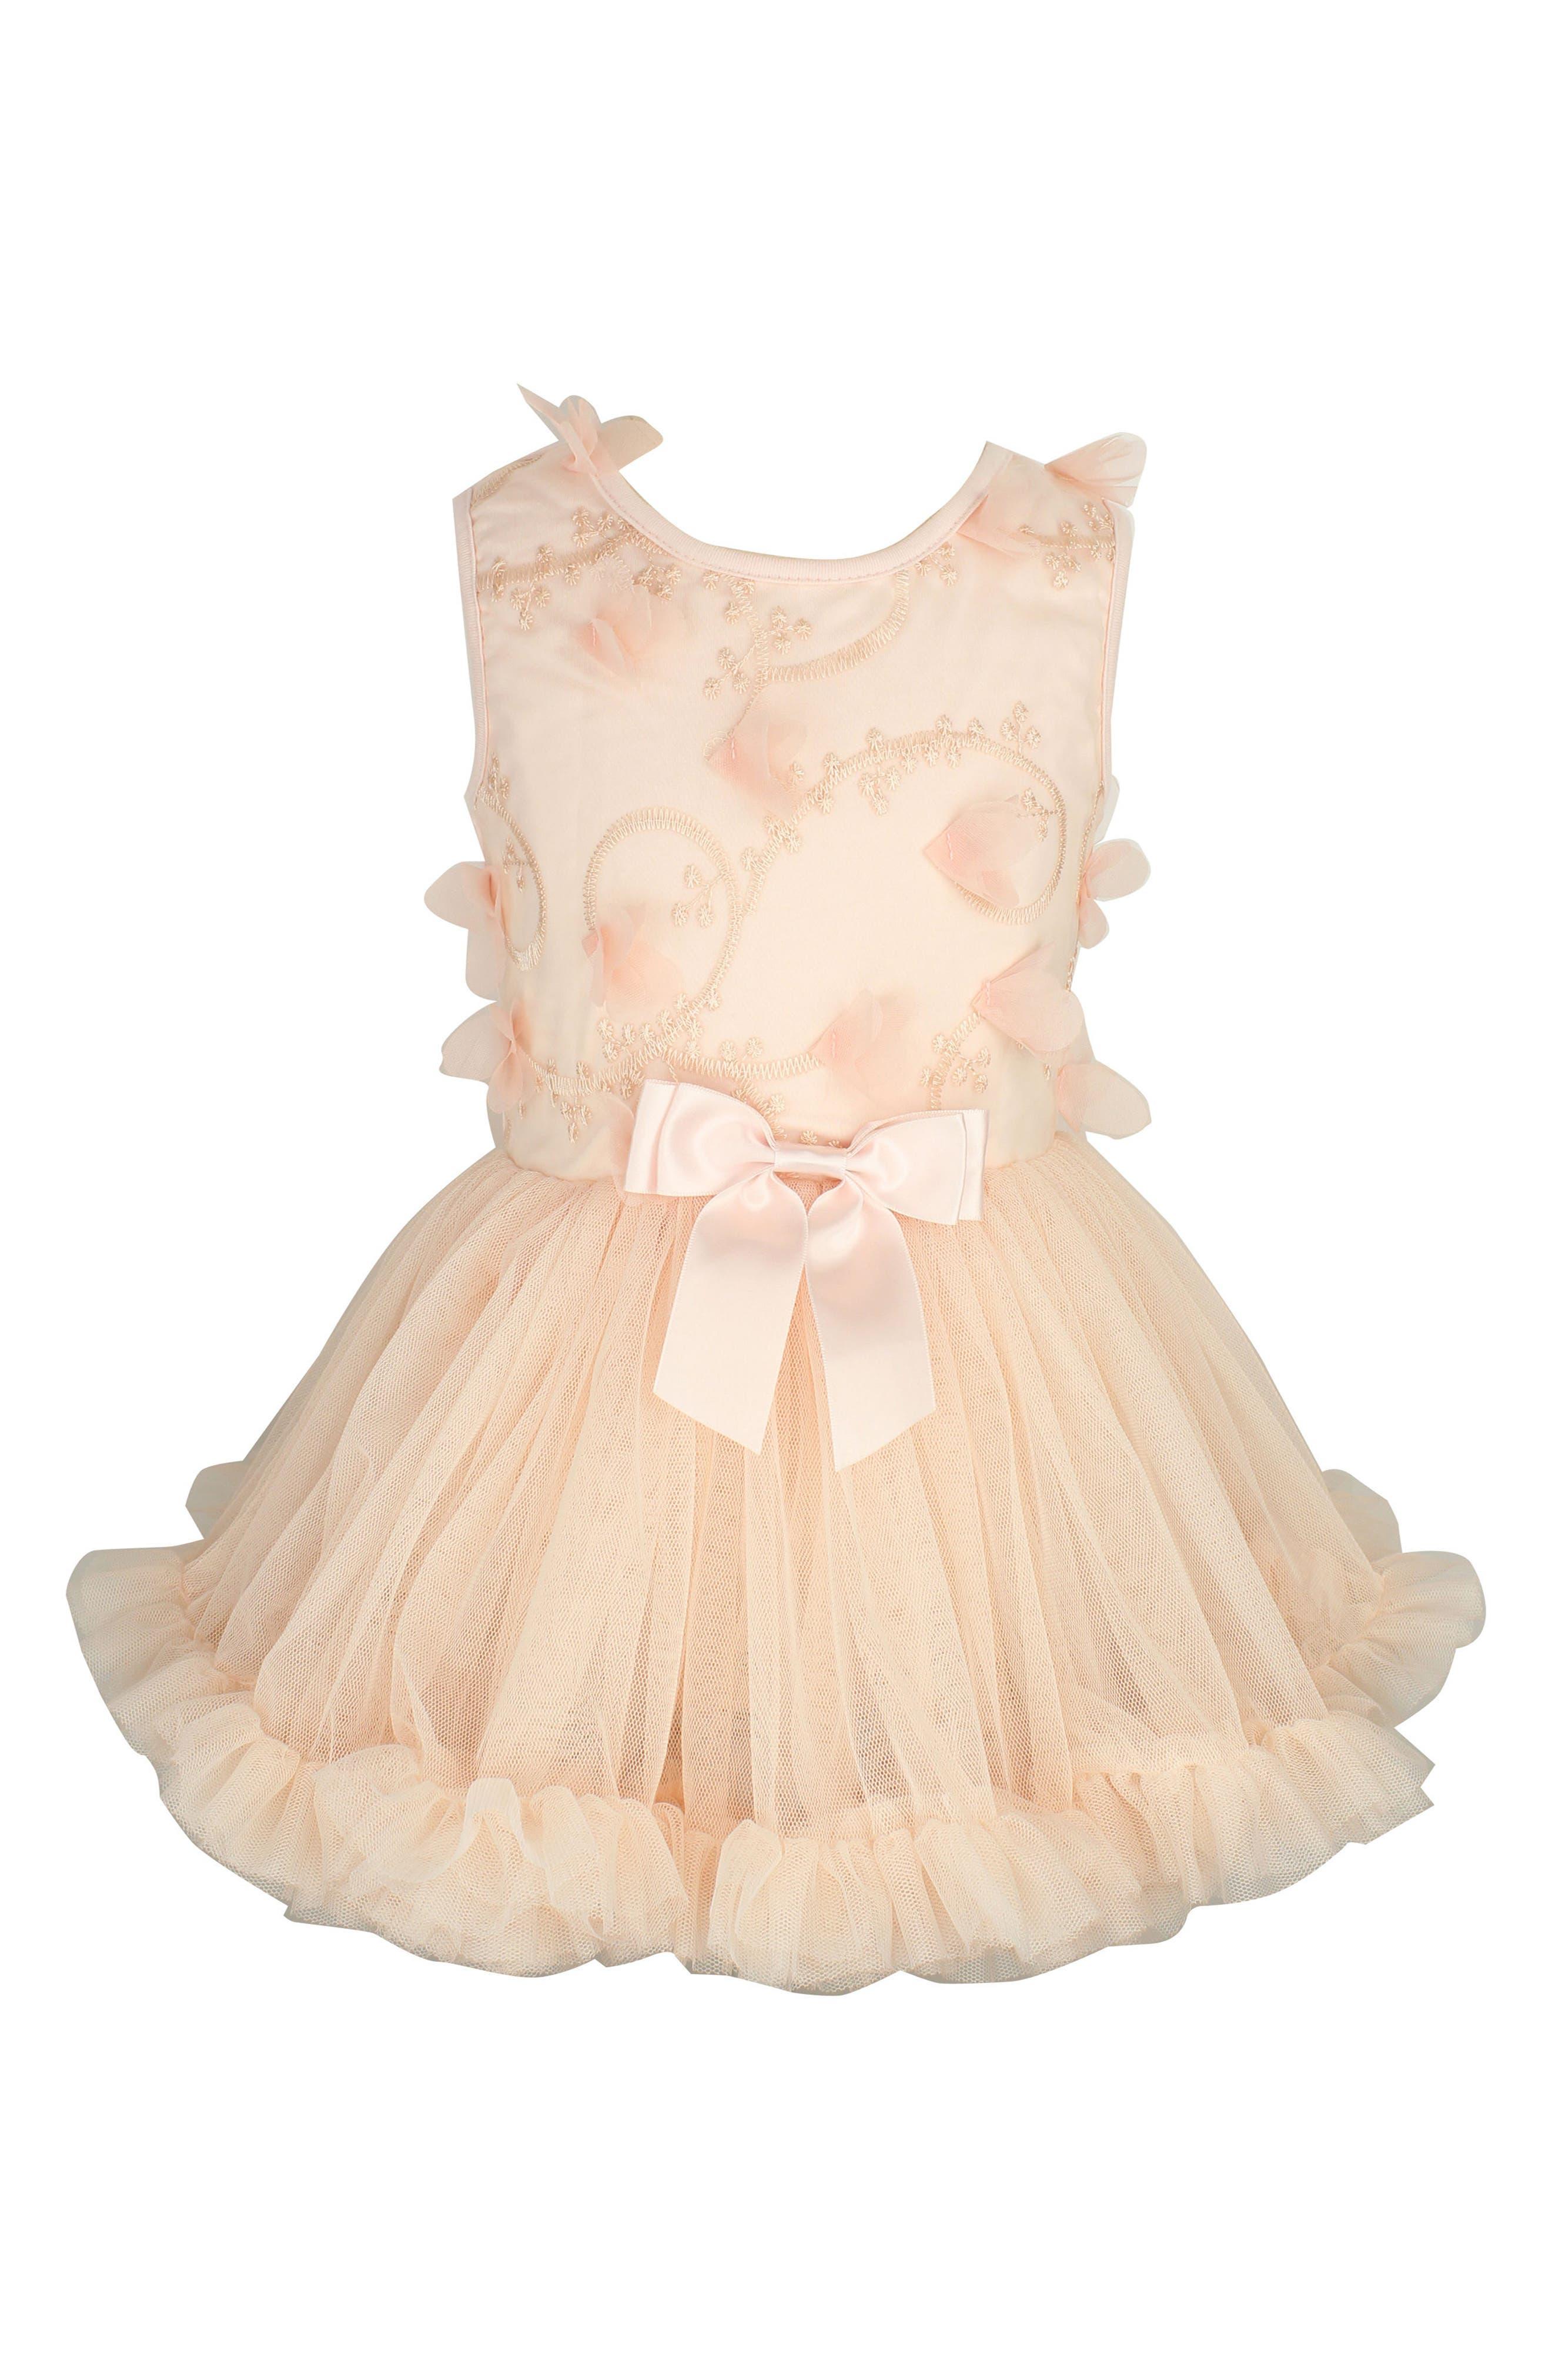 Butterfly Tutu Dress,                             Main thumbnail 1, color,                             PEACH